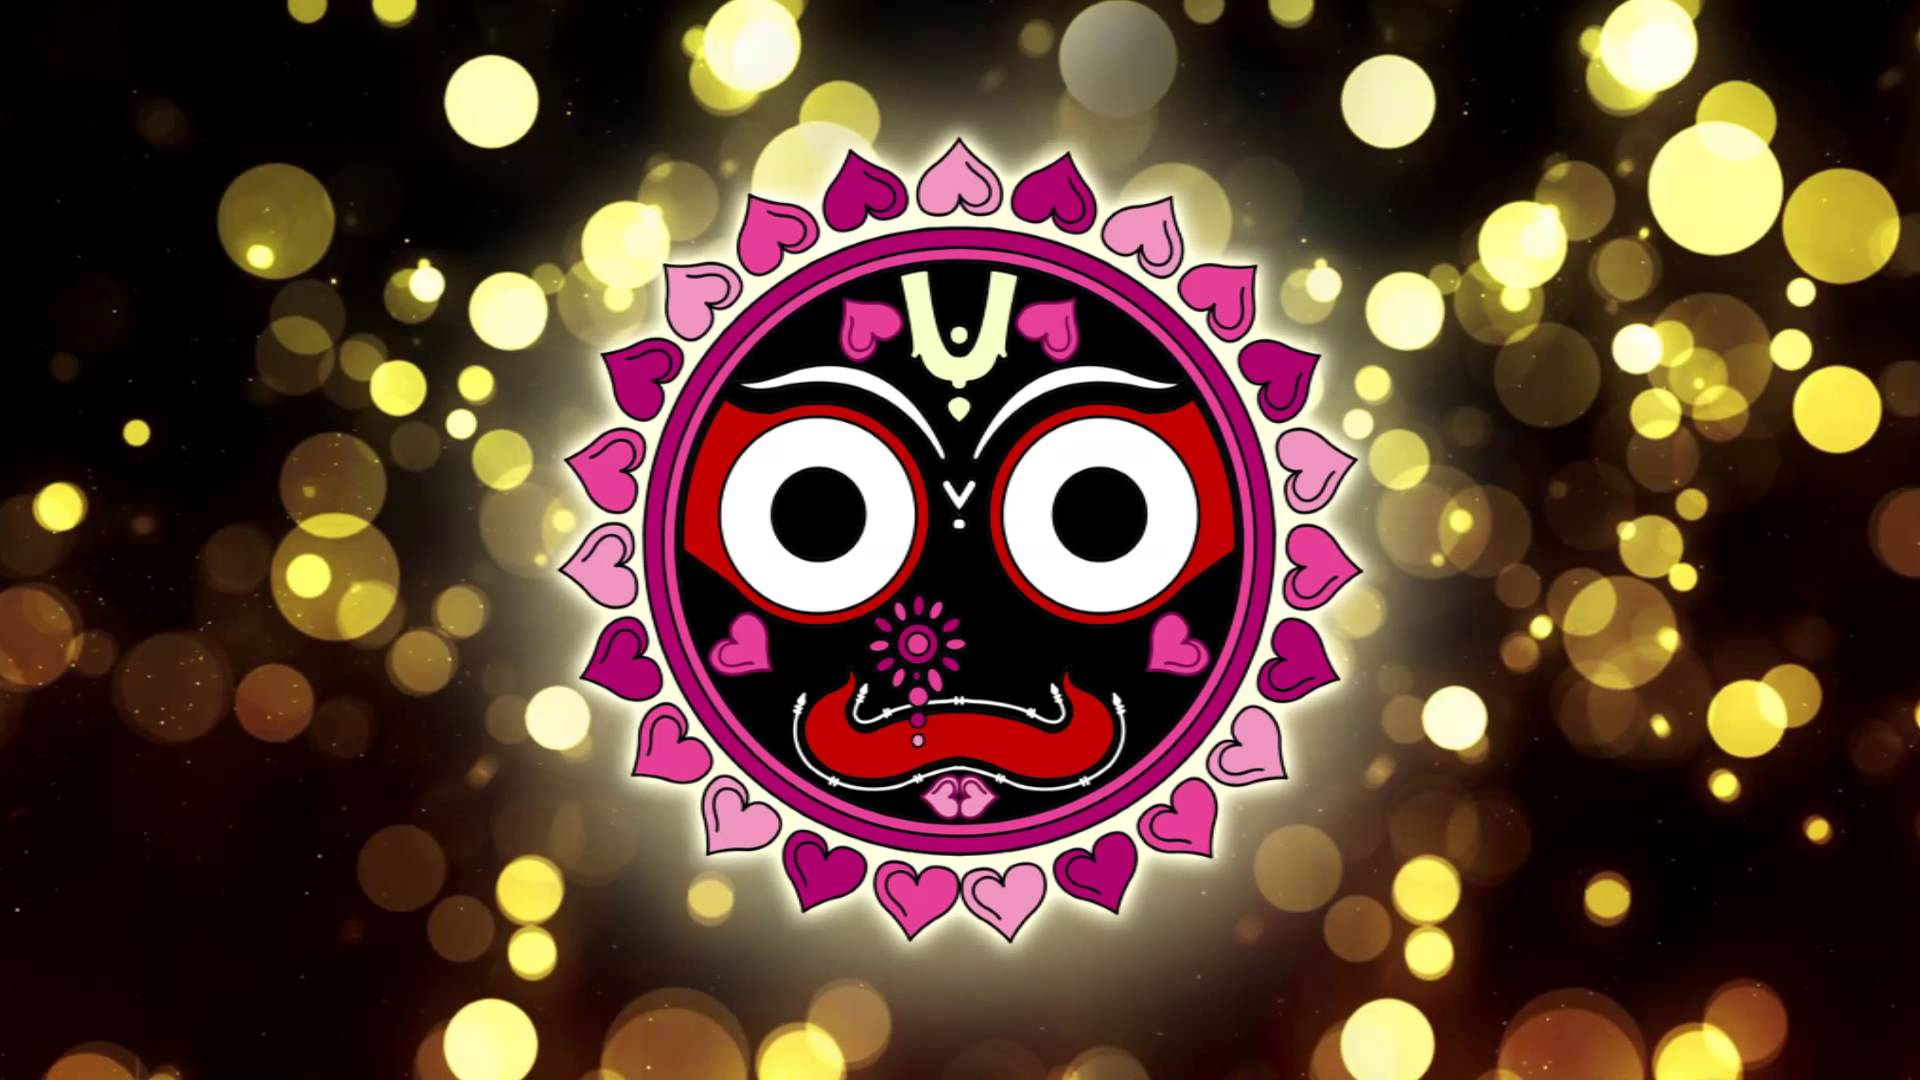 jagannath Shree jagannath temple administration provides online bookings for its guesthouses - neeladri bhakta niwas, nilachala bhakta niwas and shree 06752-233351/52/53 jagannathor@nicin.